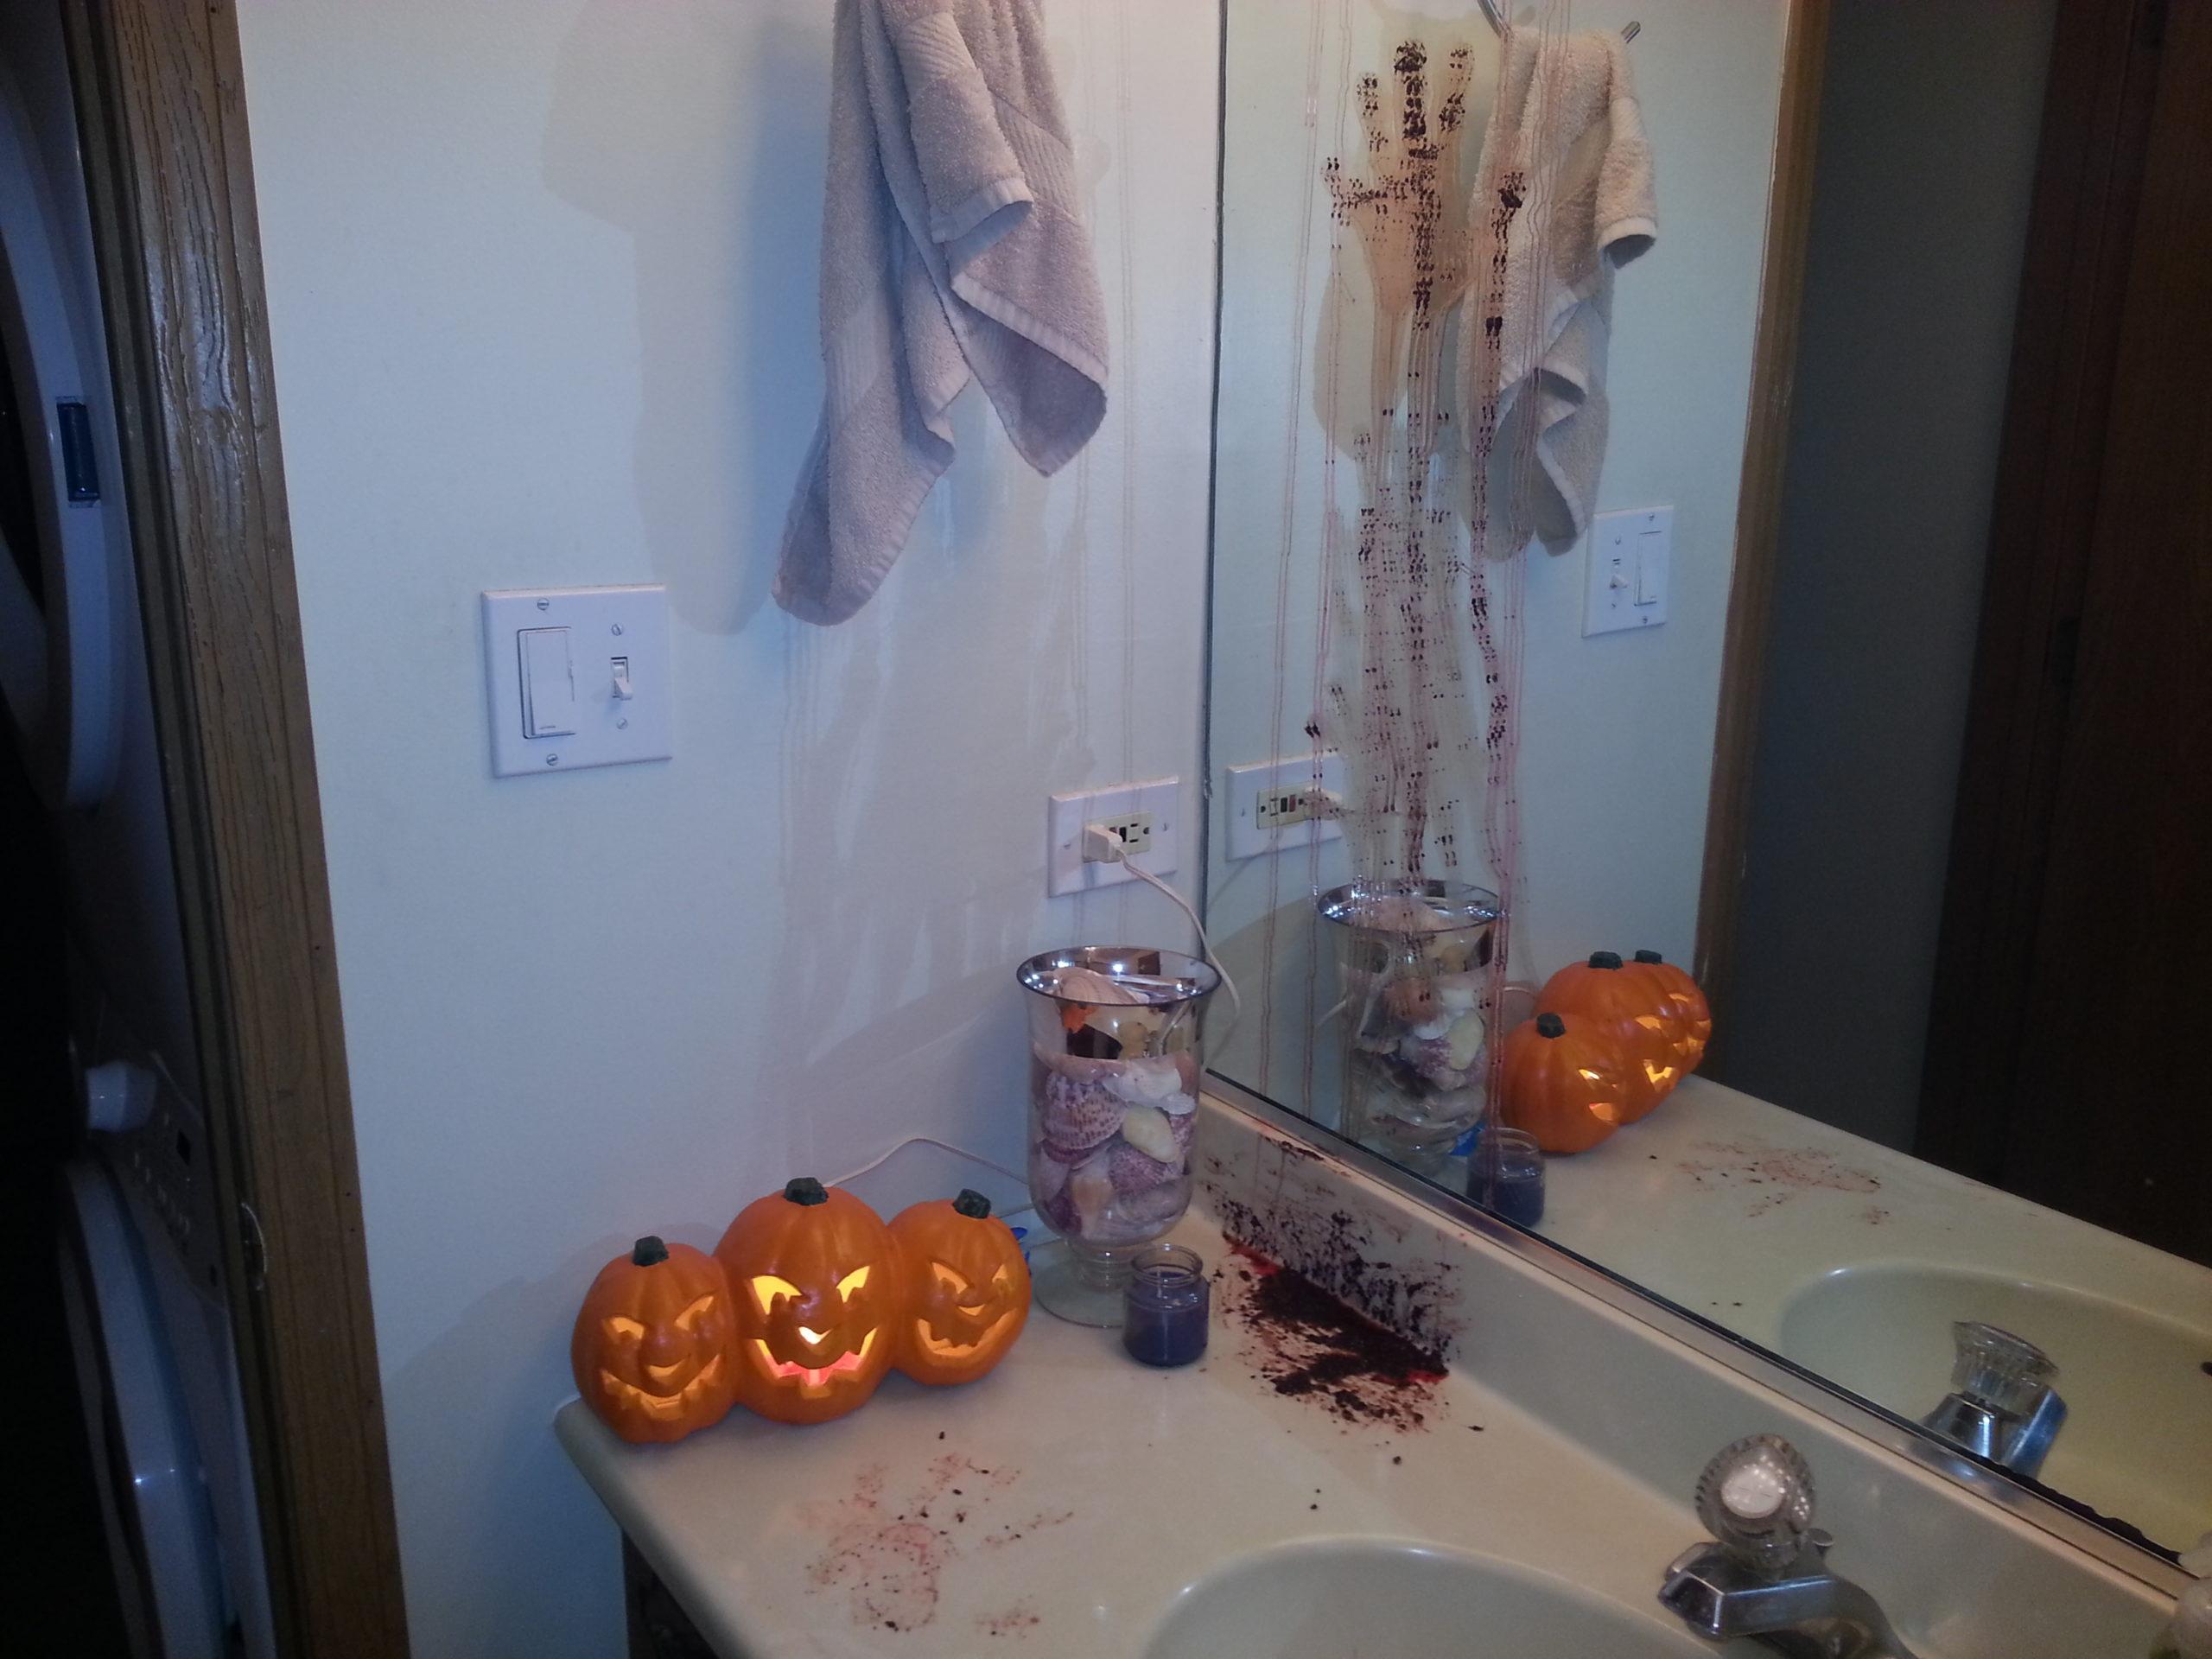 Bloody Hand Print On The Mirror Scary Halloween Bathroom Decor